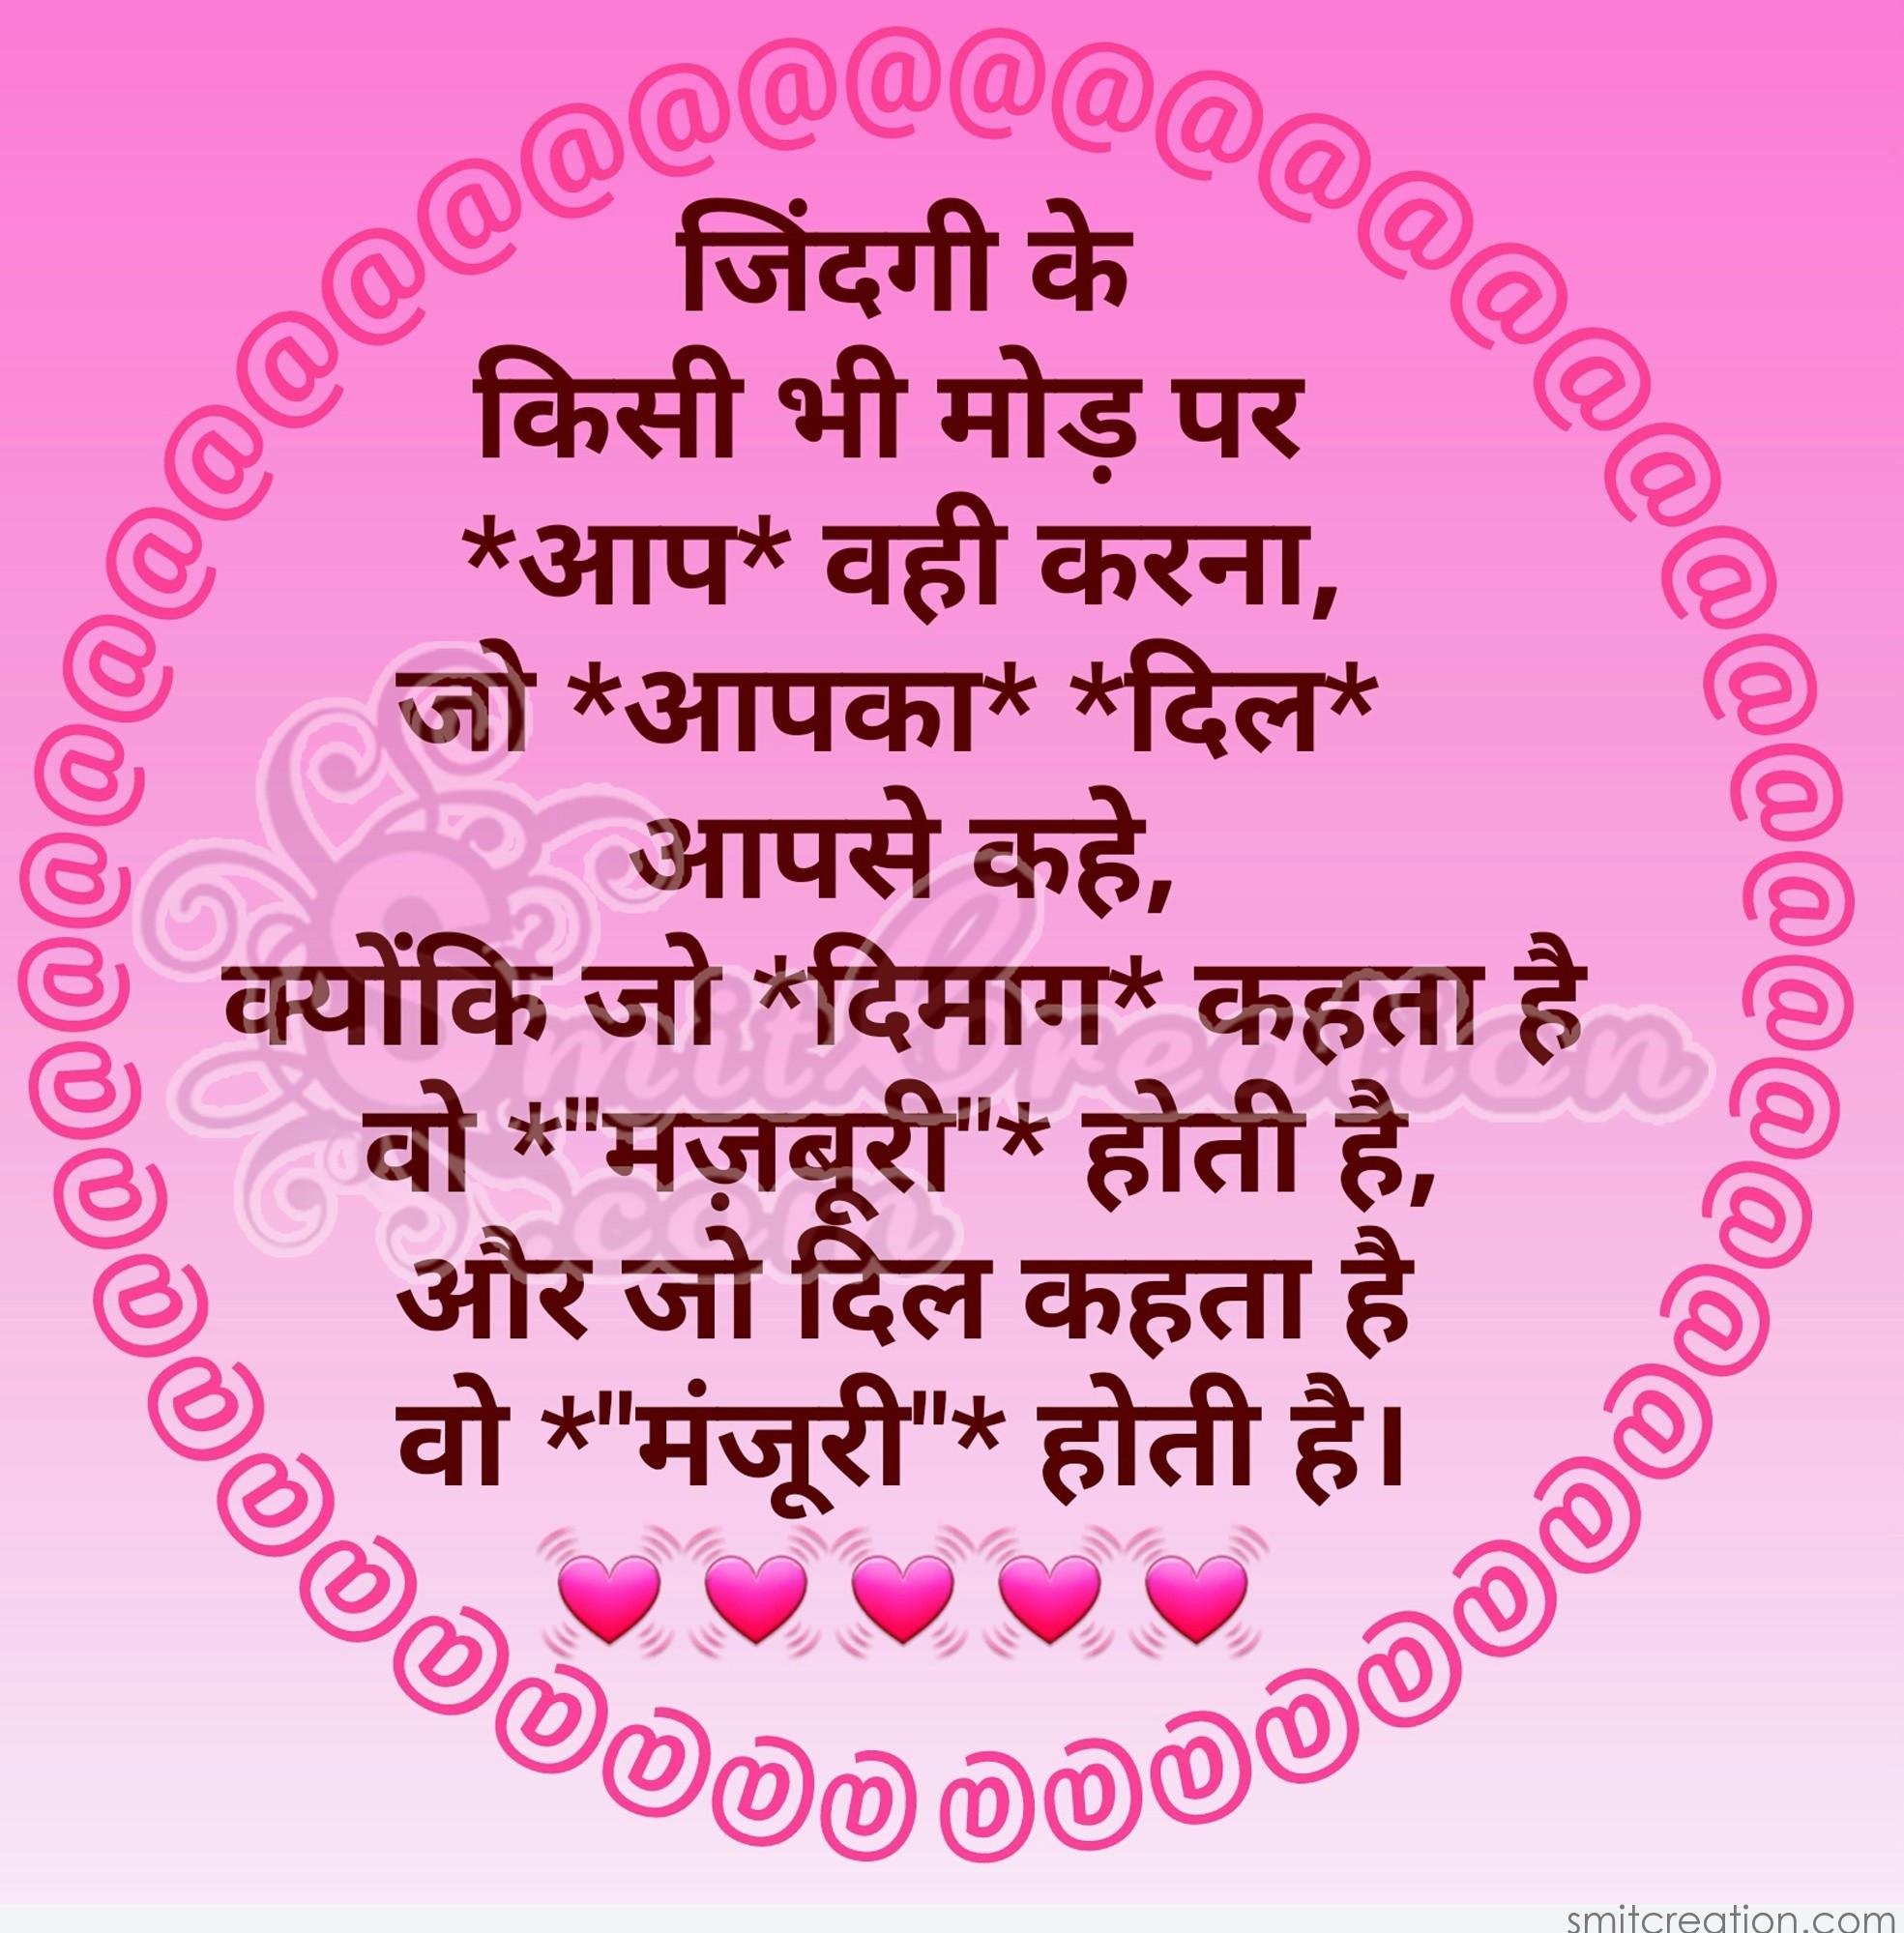 Wallpaper Of Goodnight With Quotes Wohi Karo Jo Aapka Dil Kahe Smitcreation Com